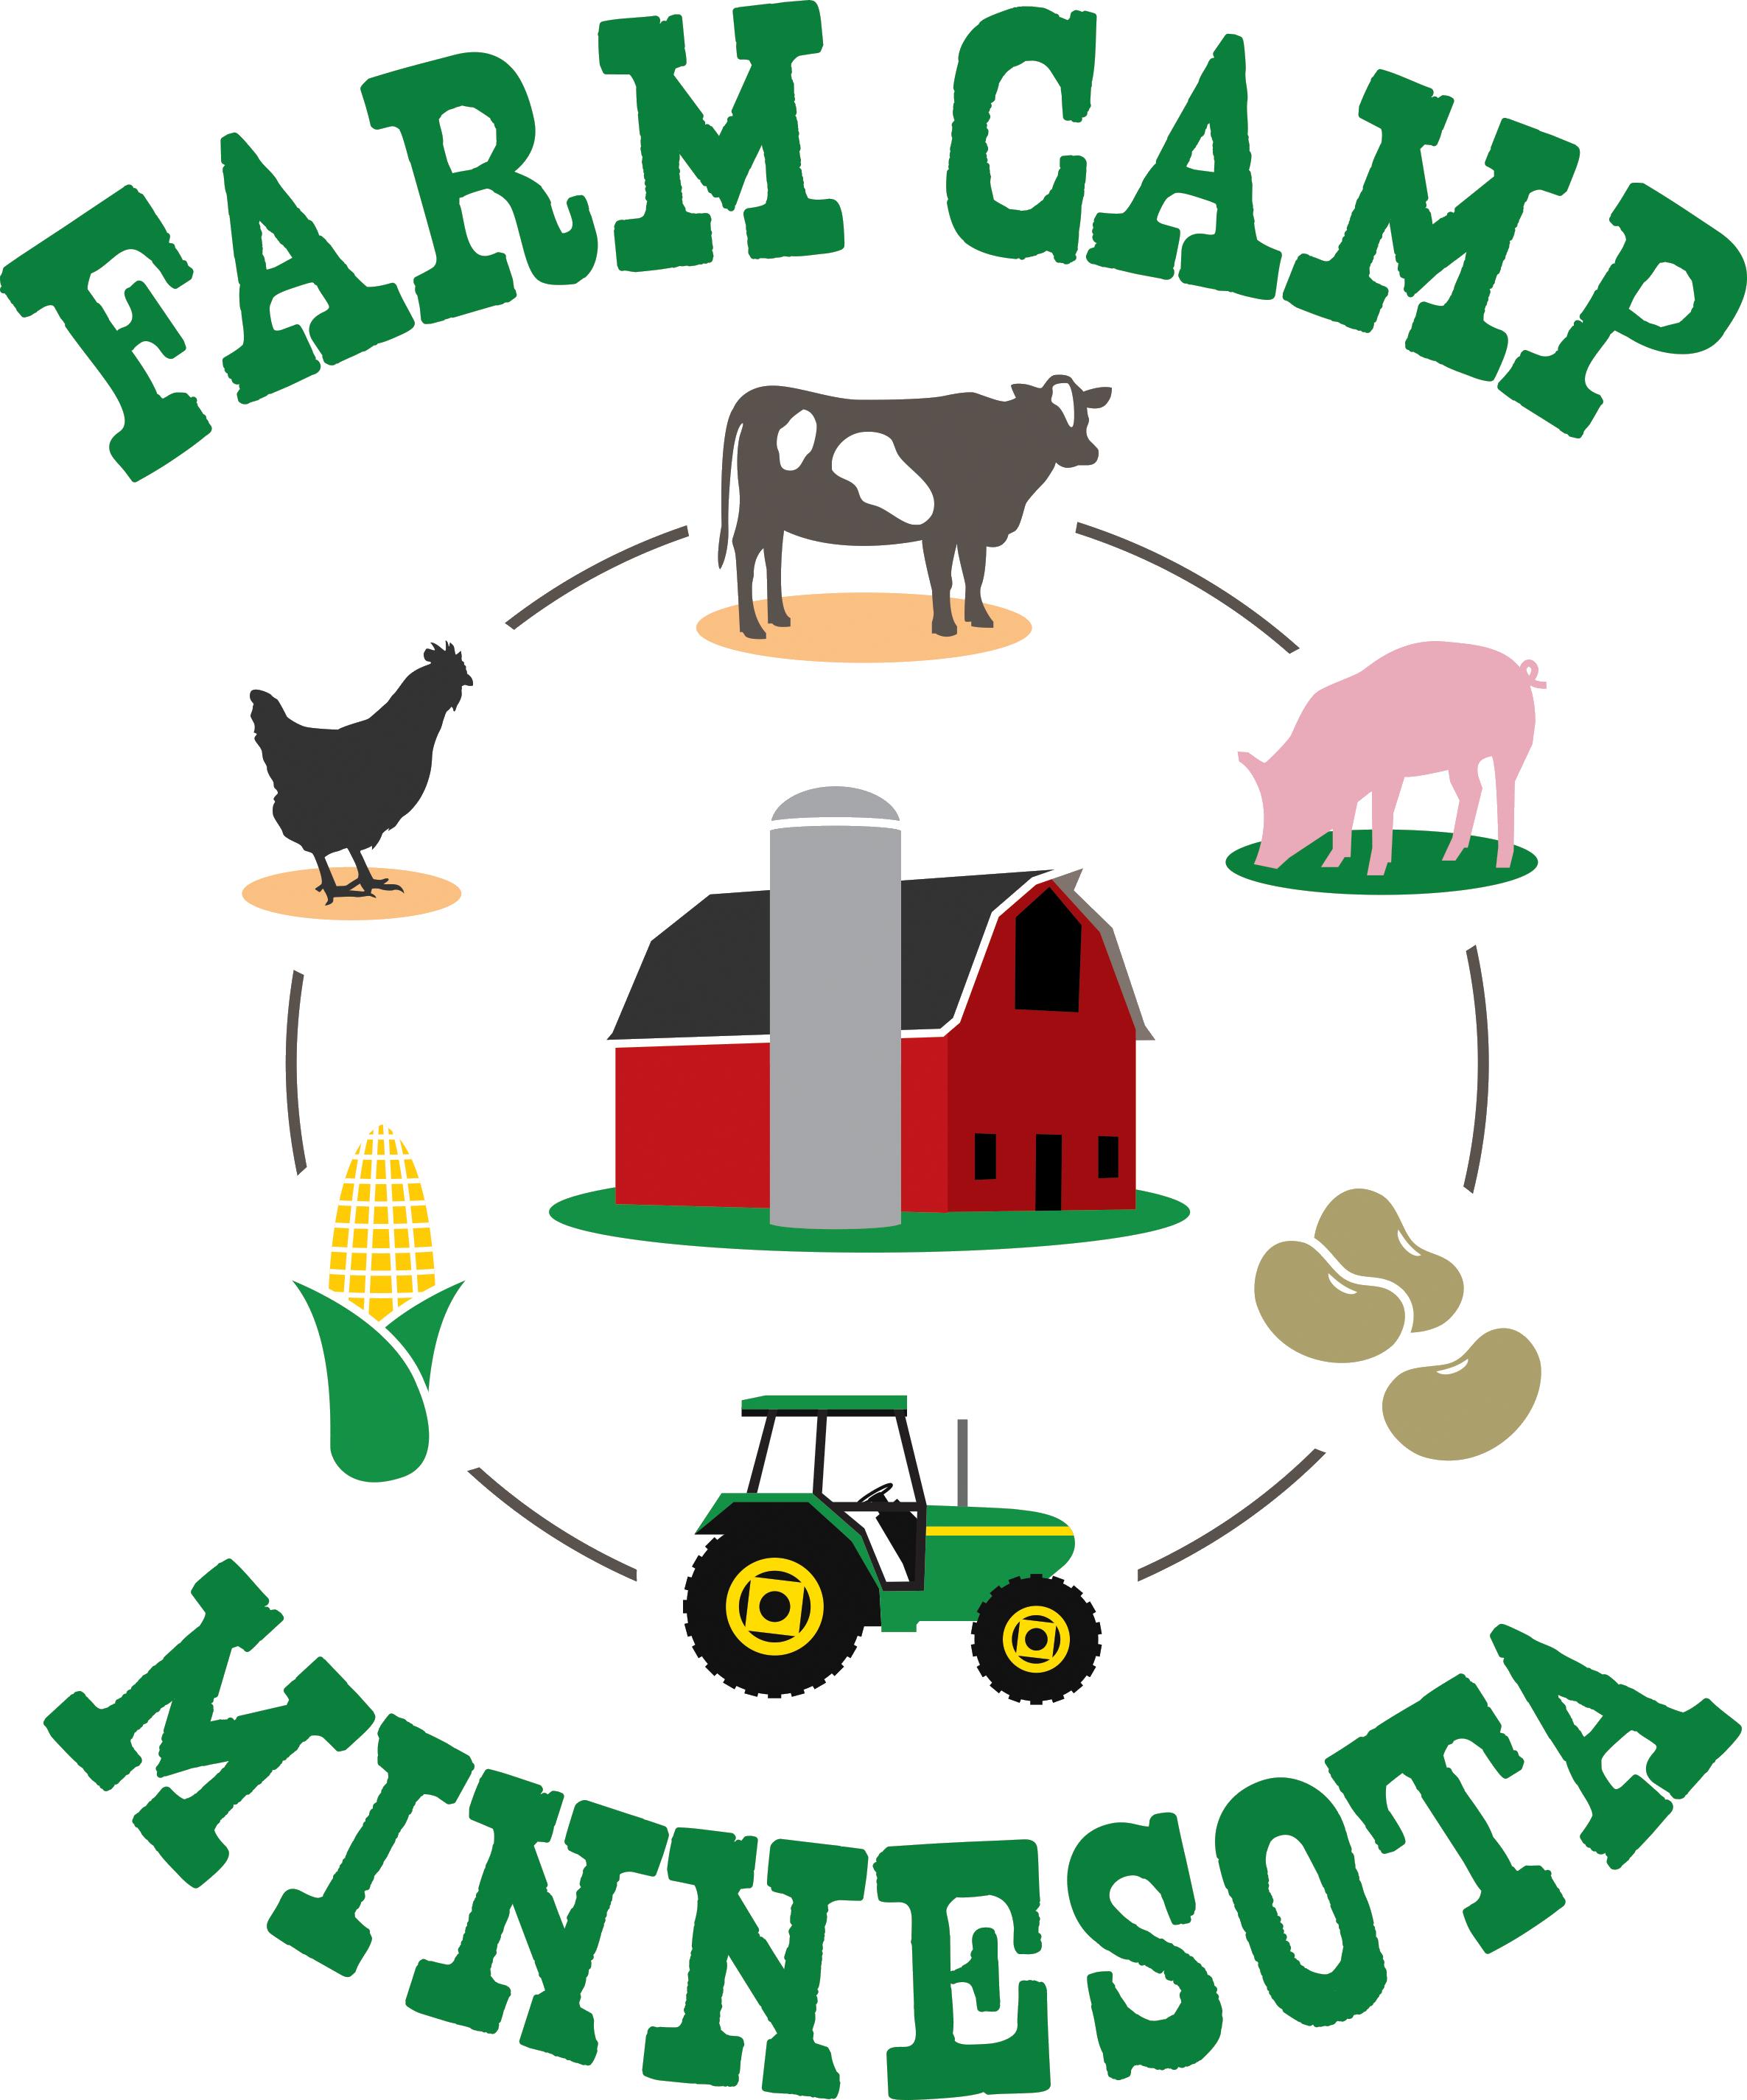 Farming clipart farm equipment. Farmcampminnesota